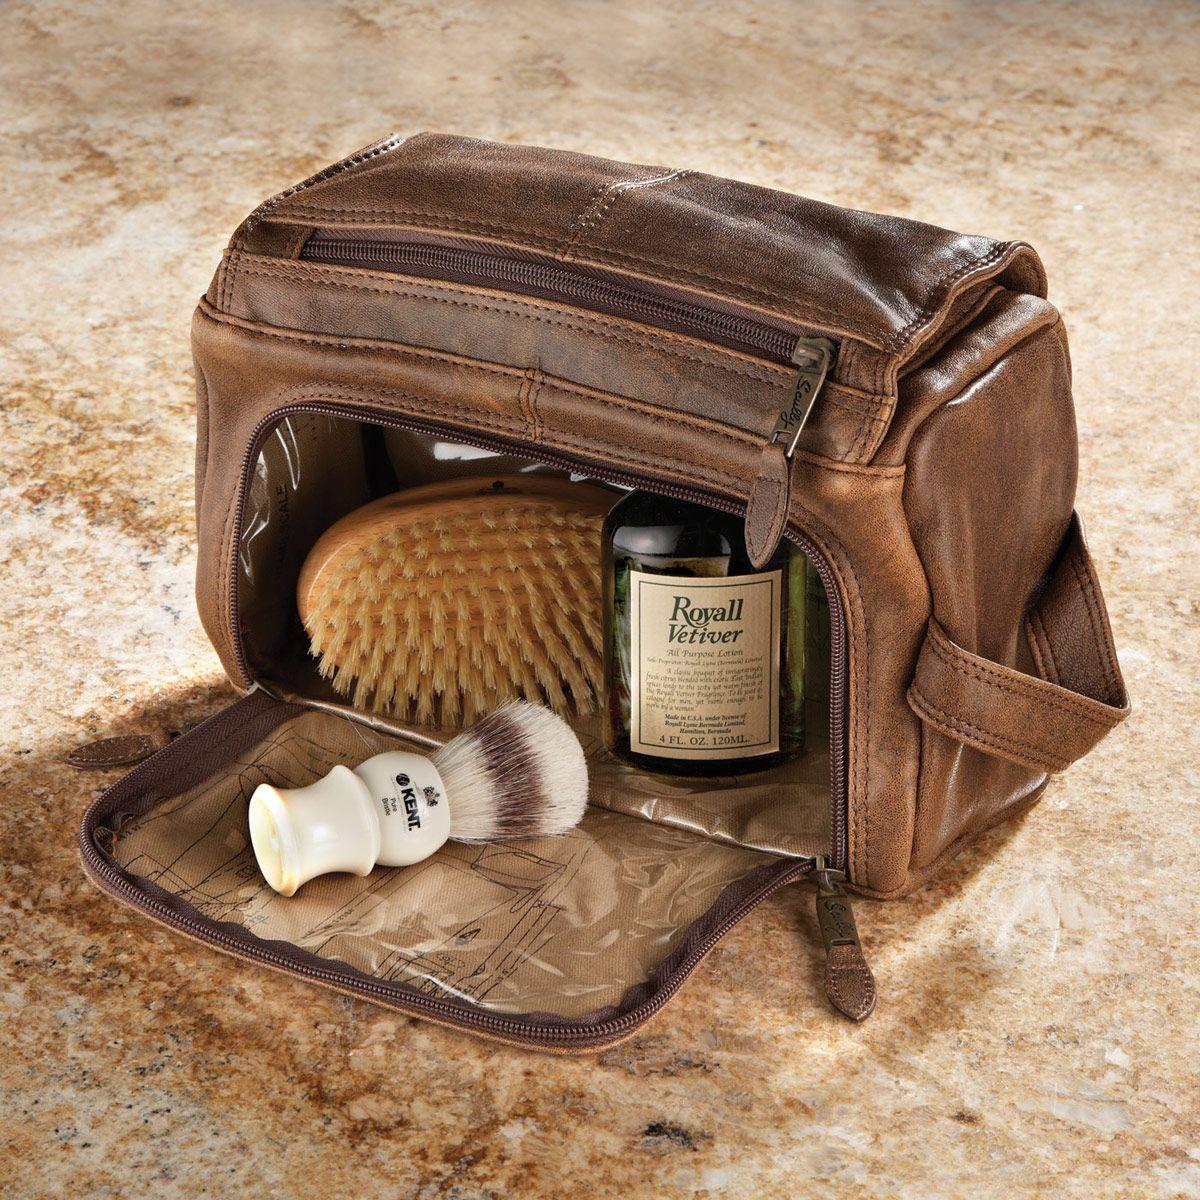 Lambskin Shave Kit - For Gentlemens Grooming Accessories Visit: http://www.bareindulgence.net